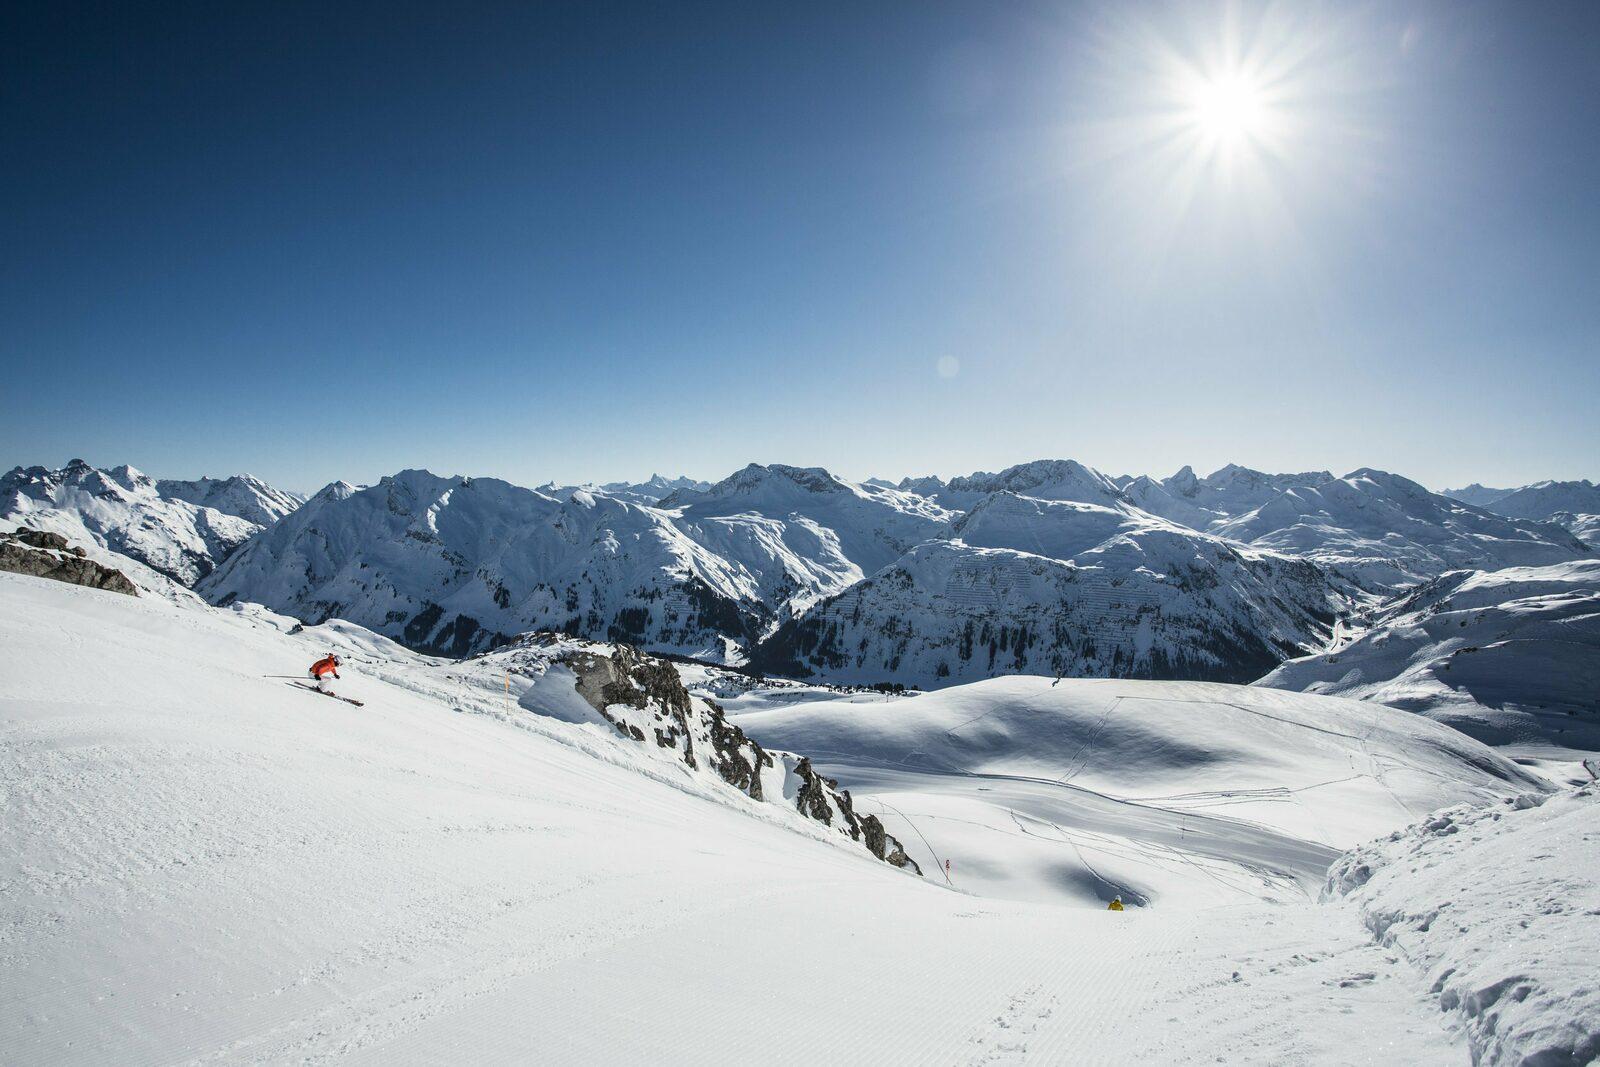 Ski area Lech - Oberlech - Zürs